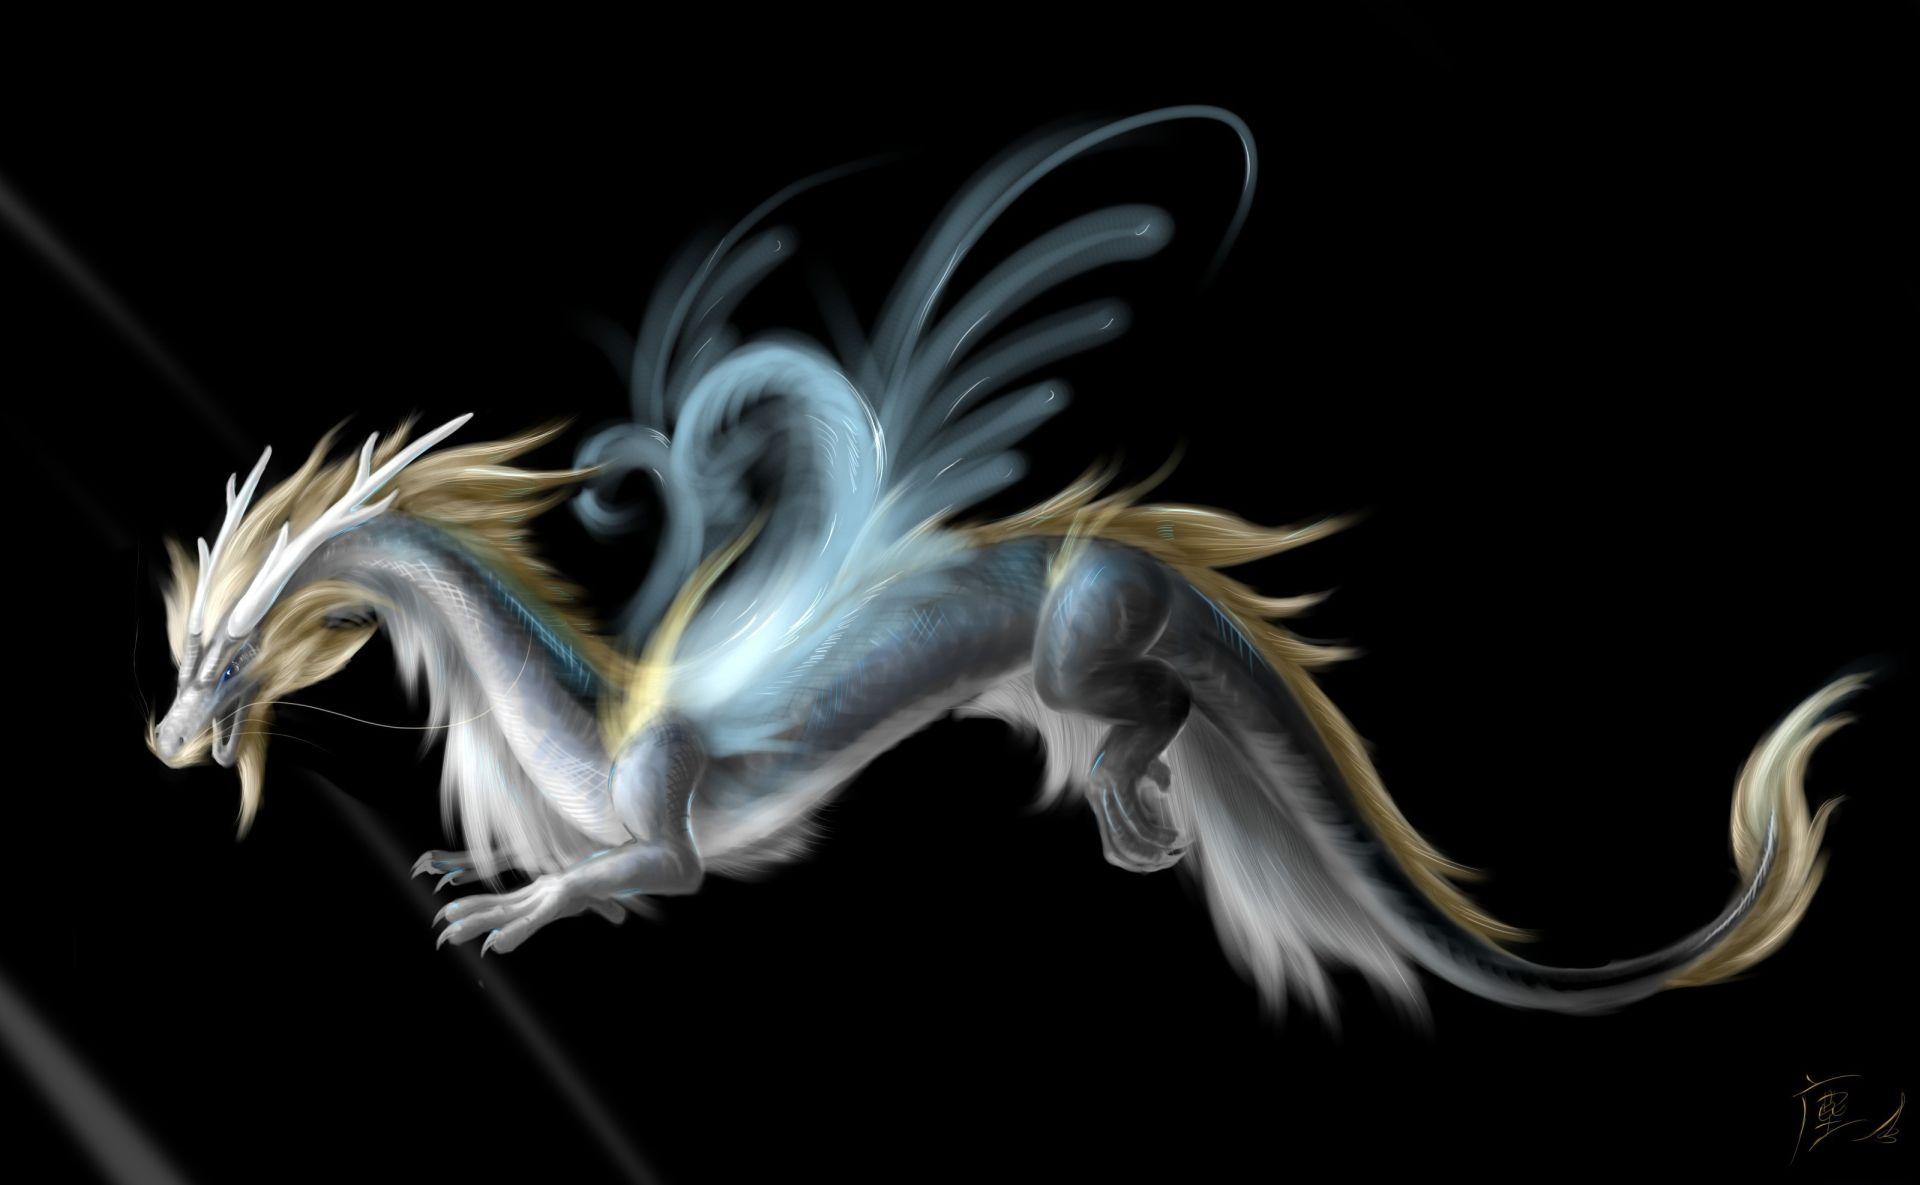 cute dragon image